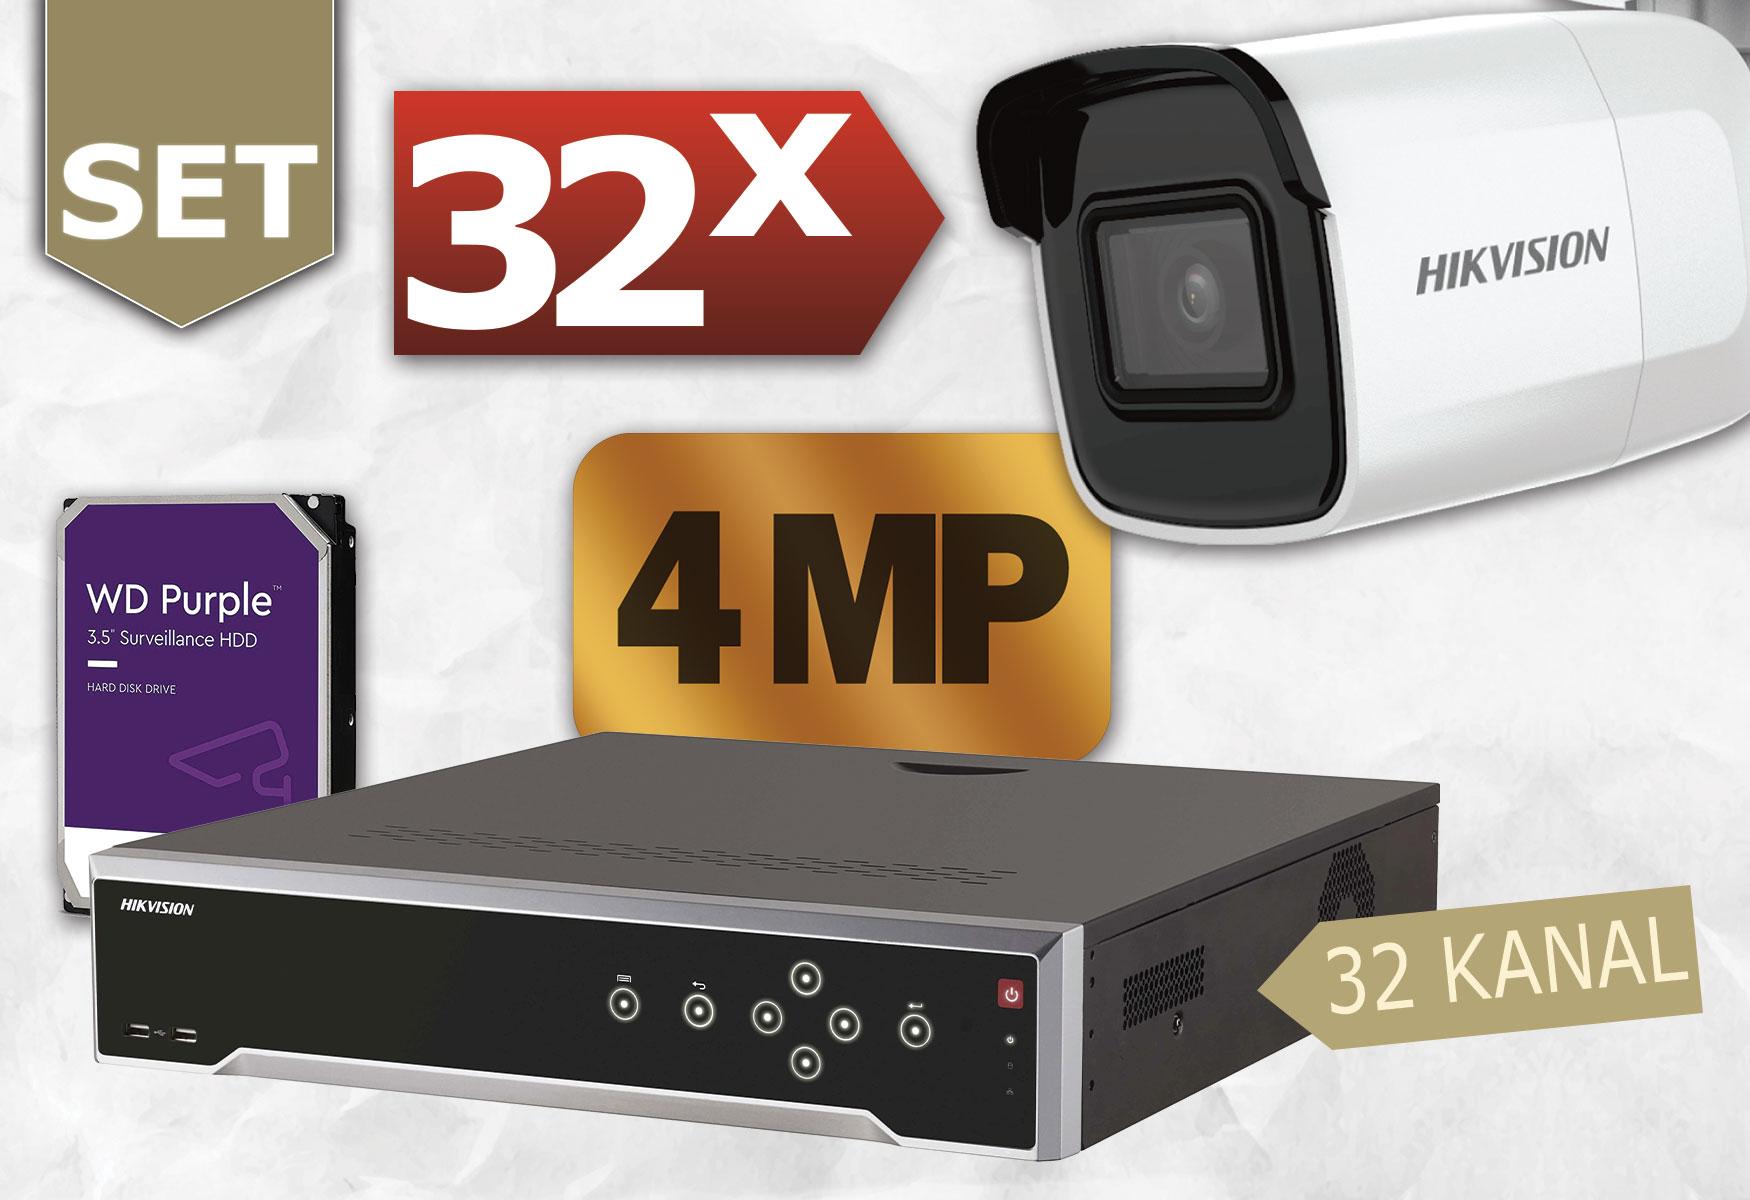 Ueberwachung-32Kanal-32x-Bullet-4MP-Produkt-Grafiken-Ueberwachungskamer-Sets-ab-16-Kameras-IP.jpg